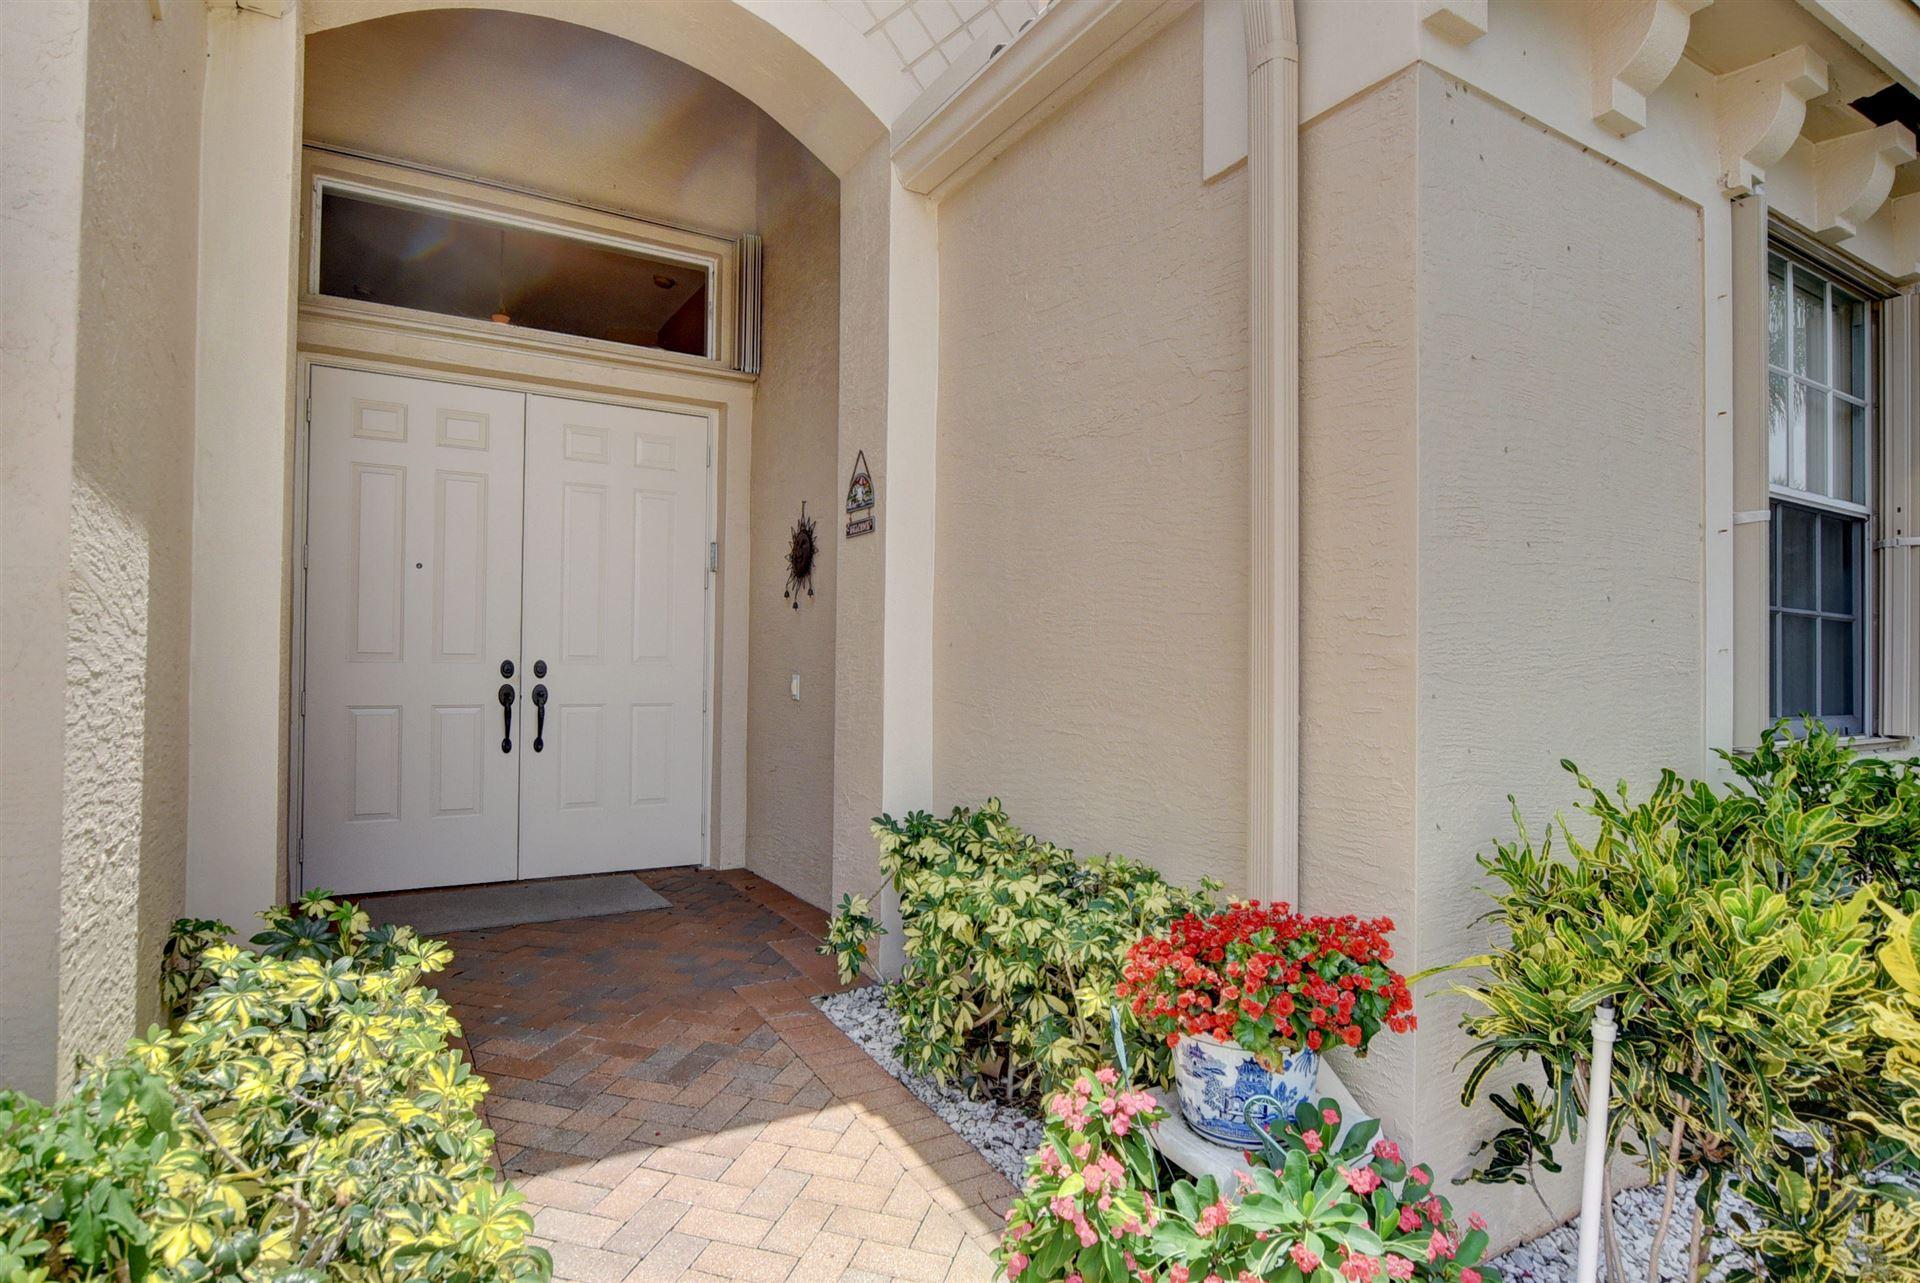 Photo of 12205 Landrum Way, Boynton Beach, FL 33437 (MLS # RX-10632982)